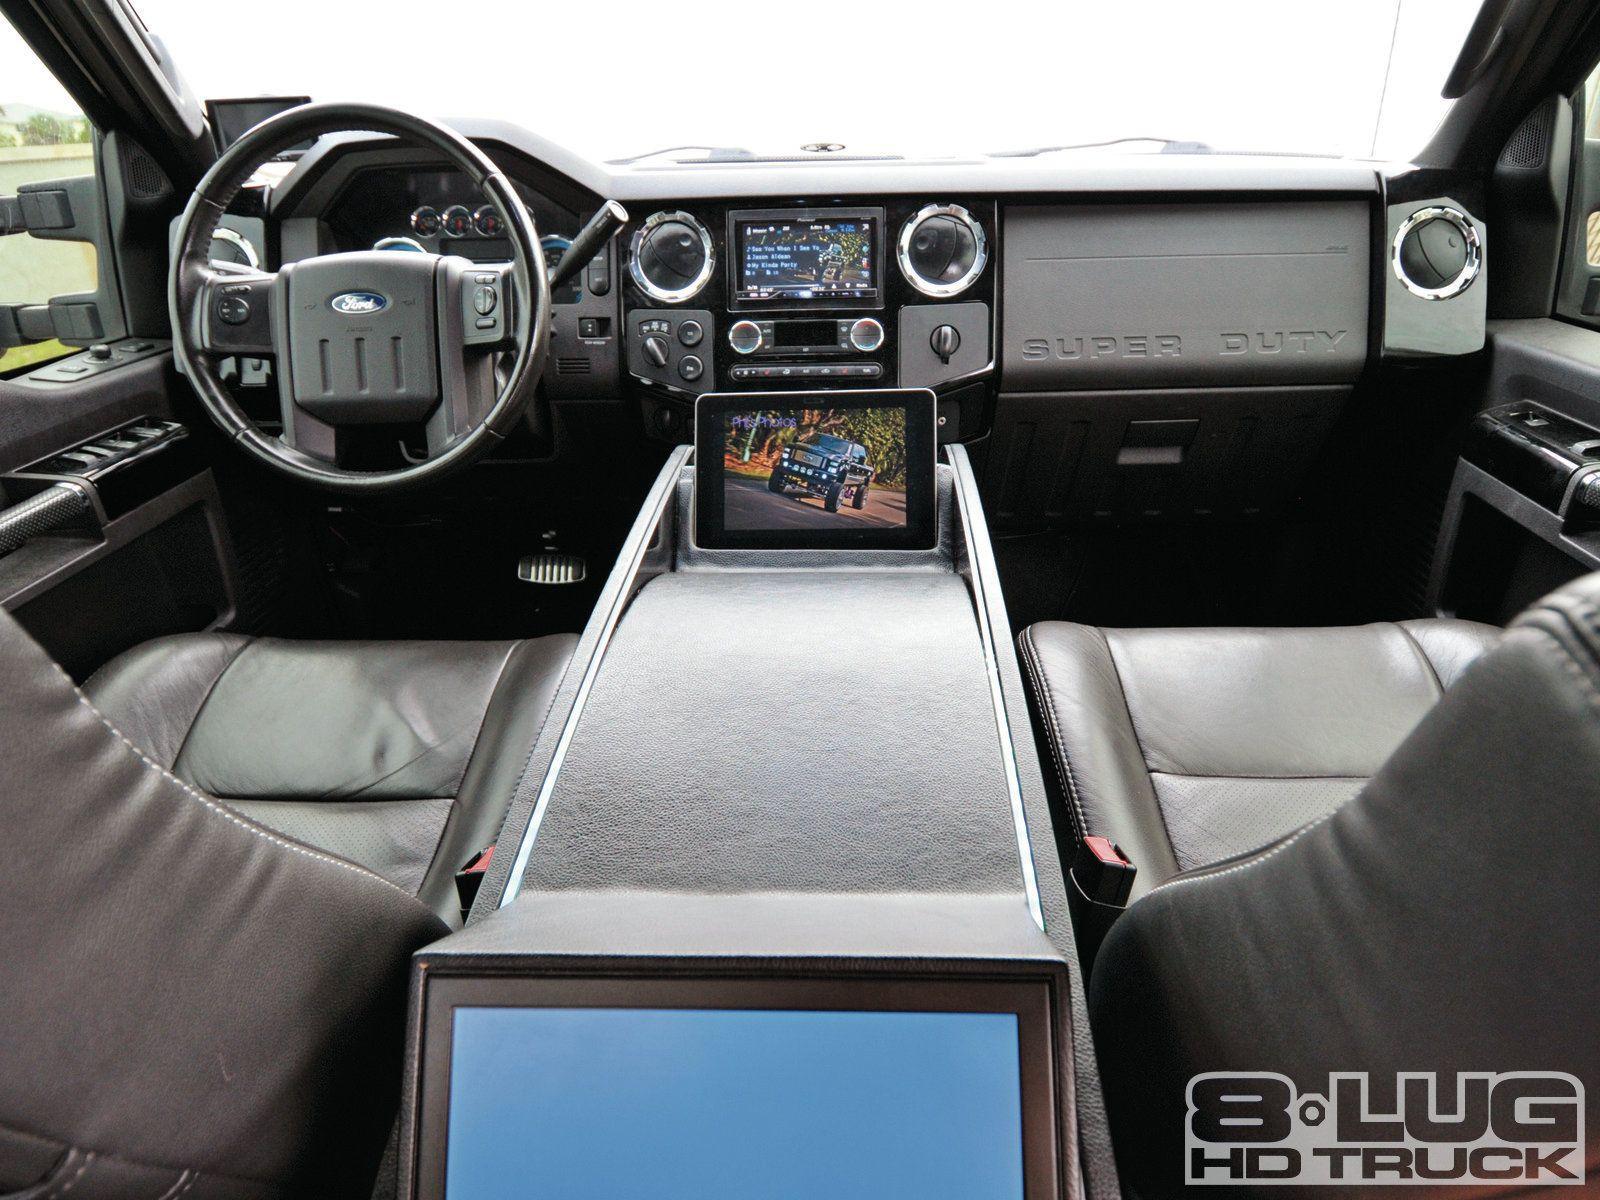 medium resolution of 1301 8l 09 sema was the goal custom center console